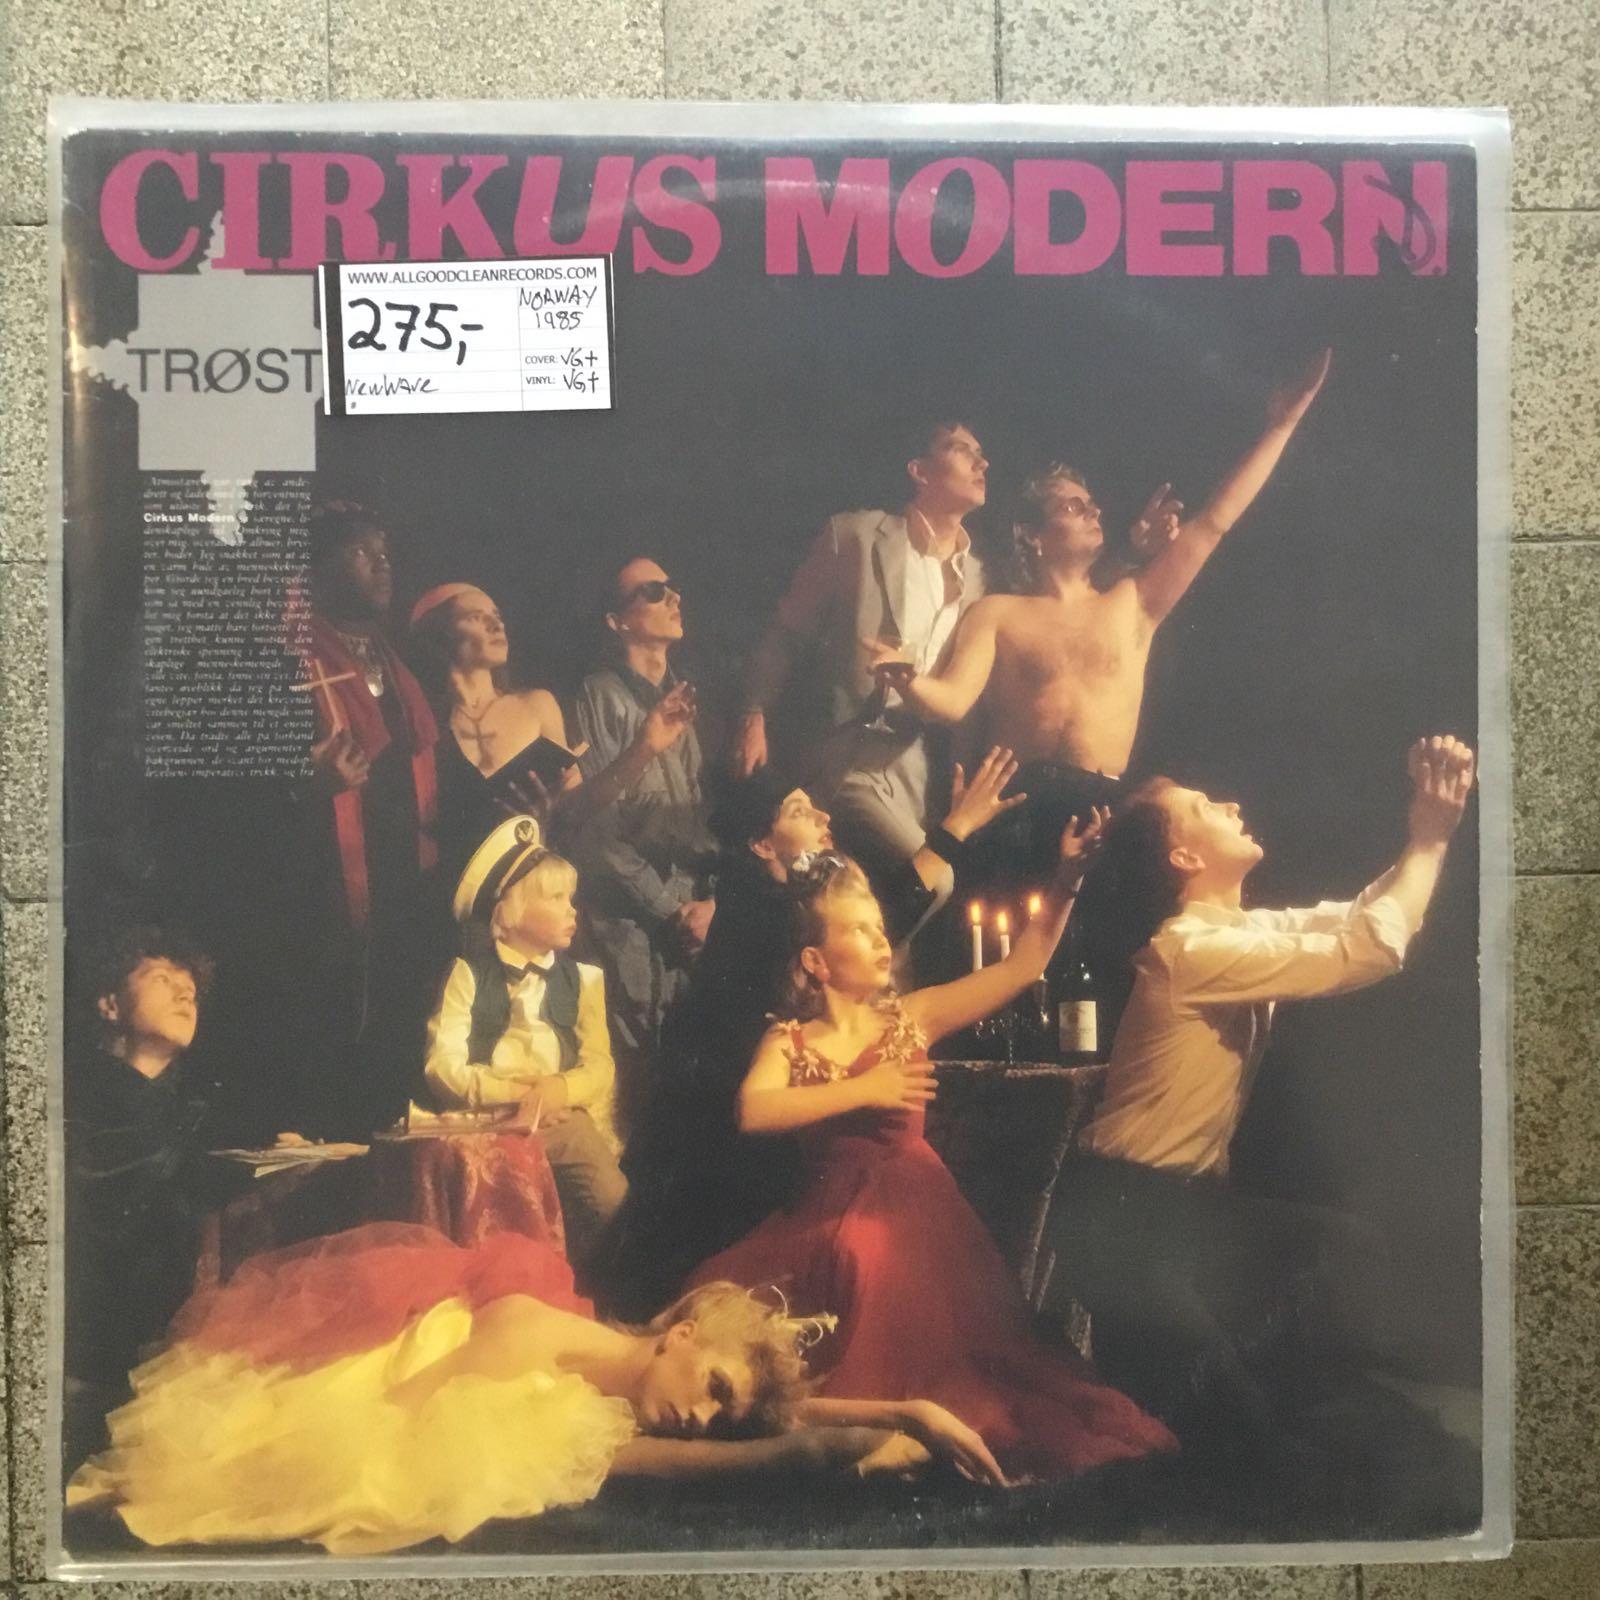 Cirkus Modern – Trøst [LP] (2. hand)